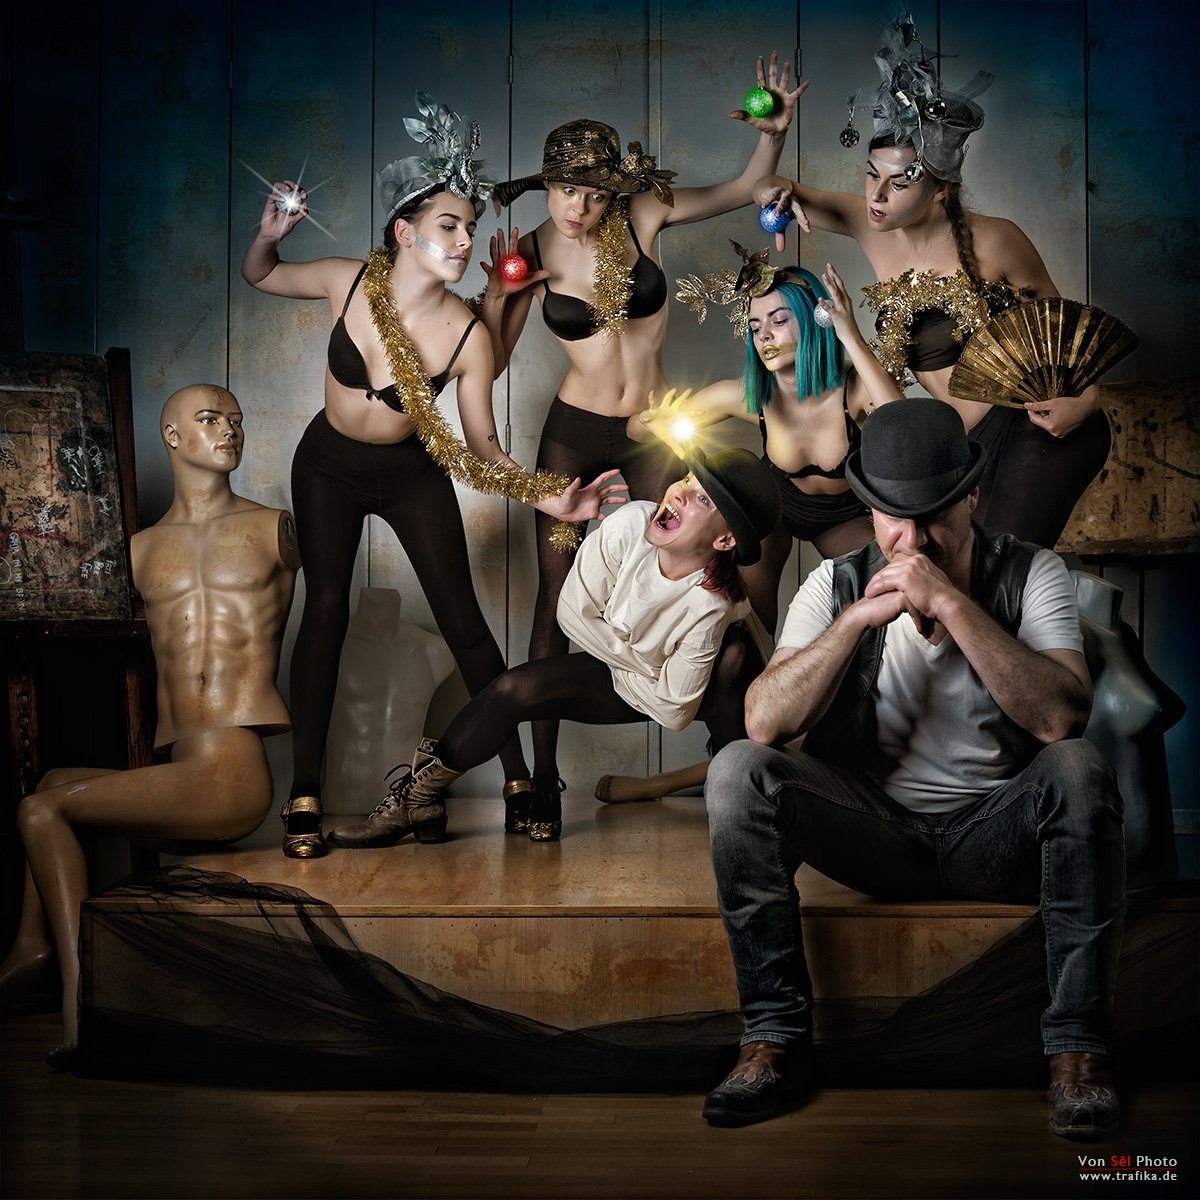 new, year, xmas, balls, lights, girls, mad, hats, dolls, Von Sel